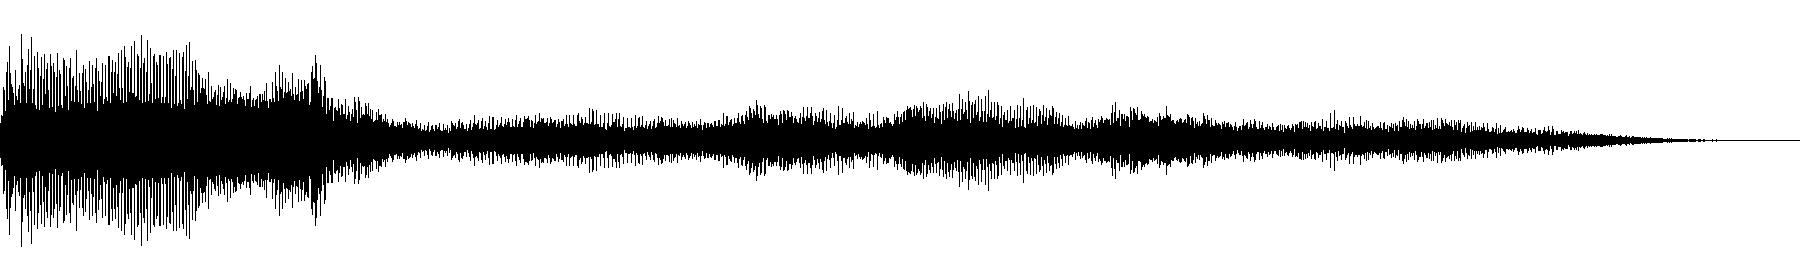 vocal 03